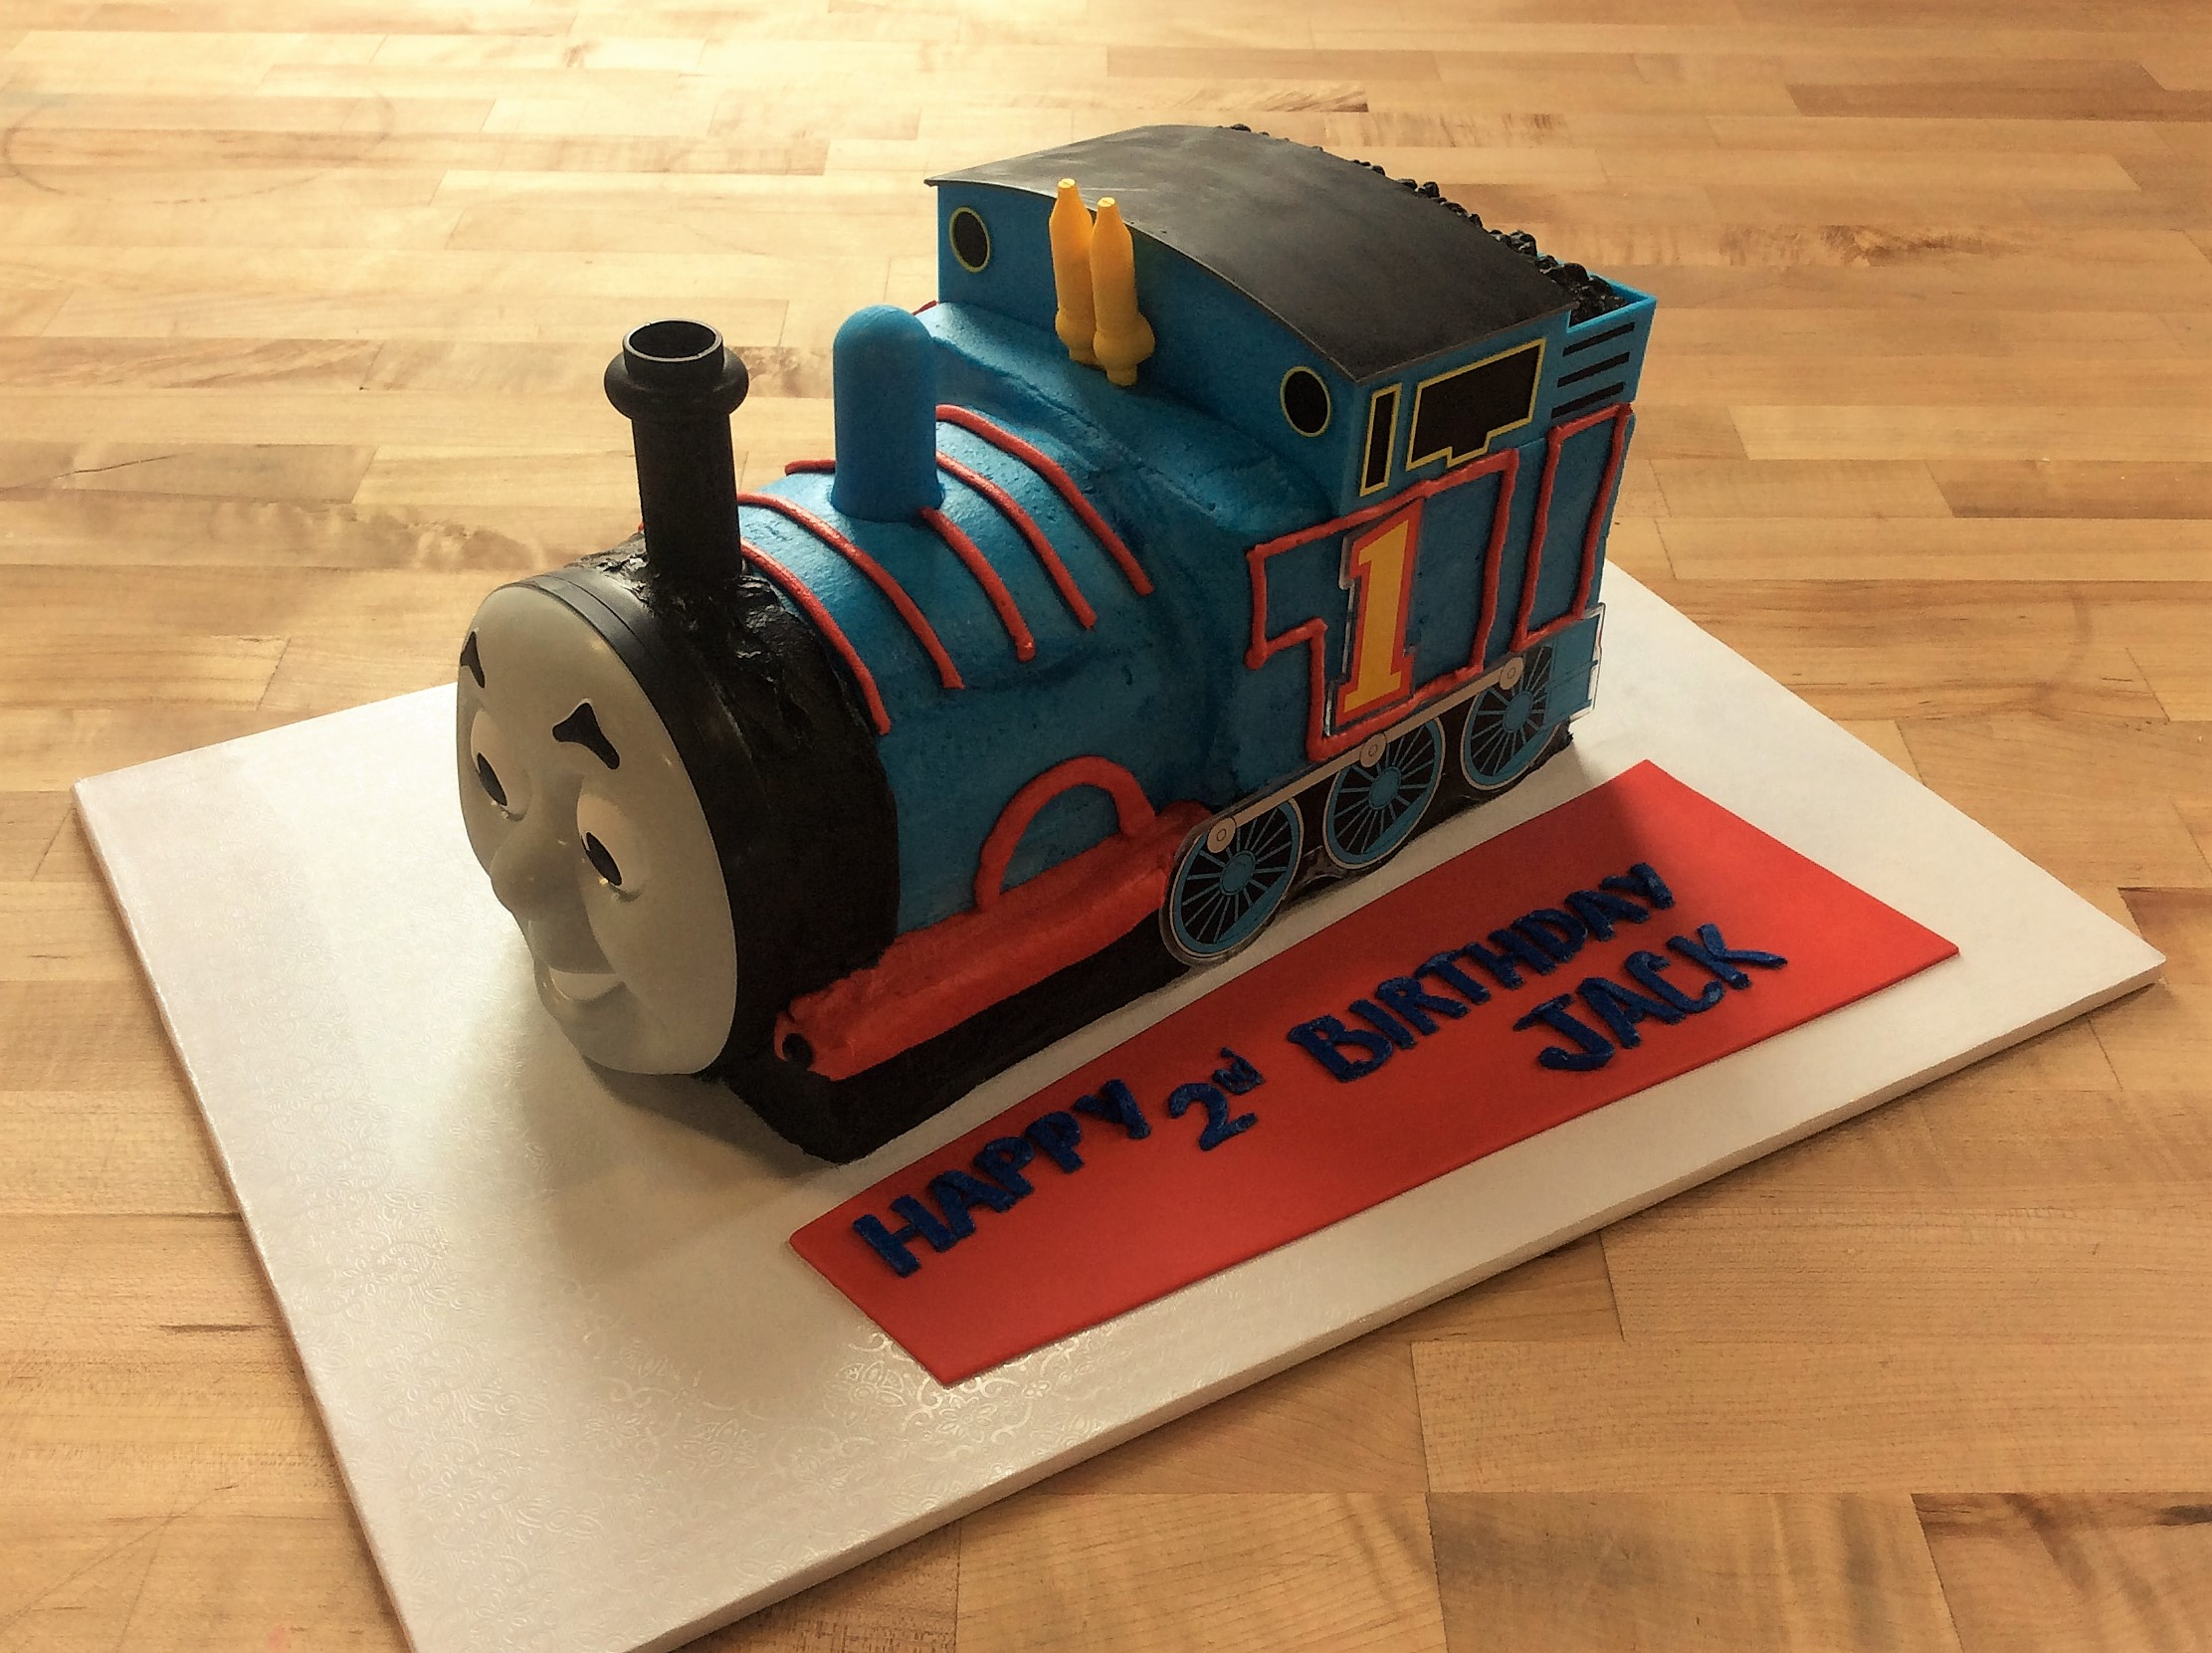 Thomas the Train Shaped Cake